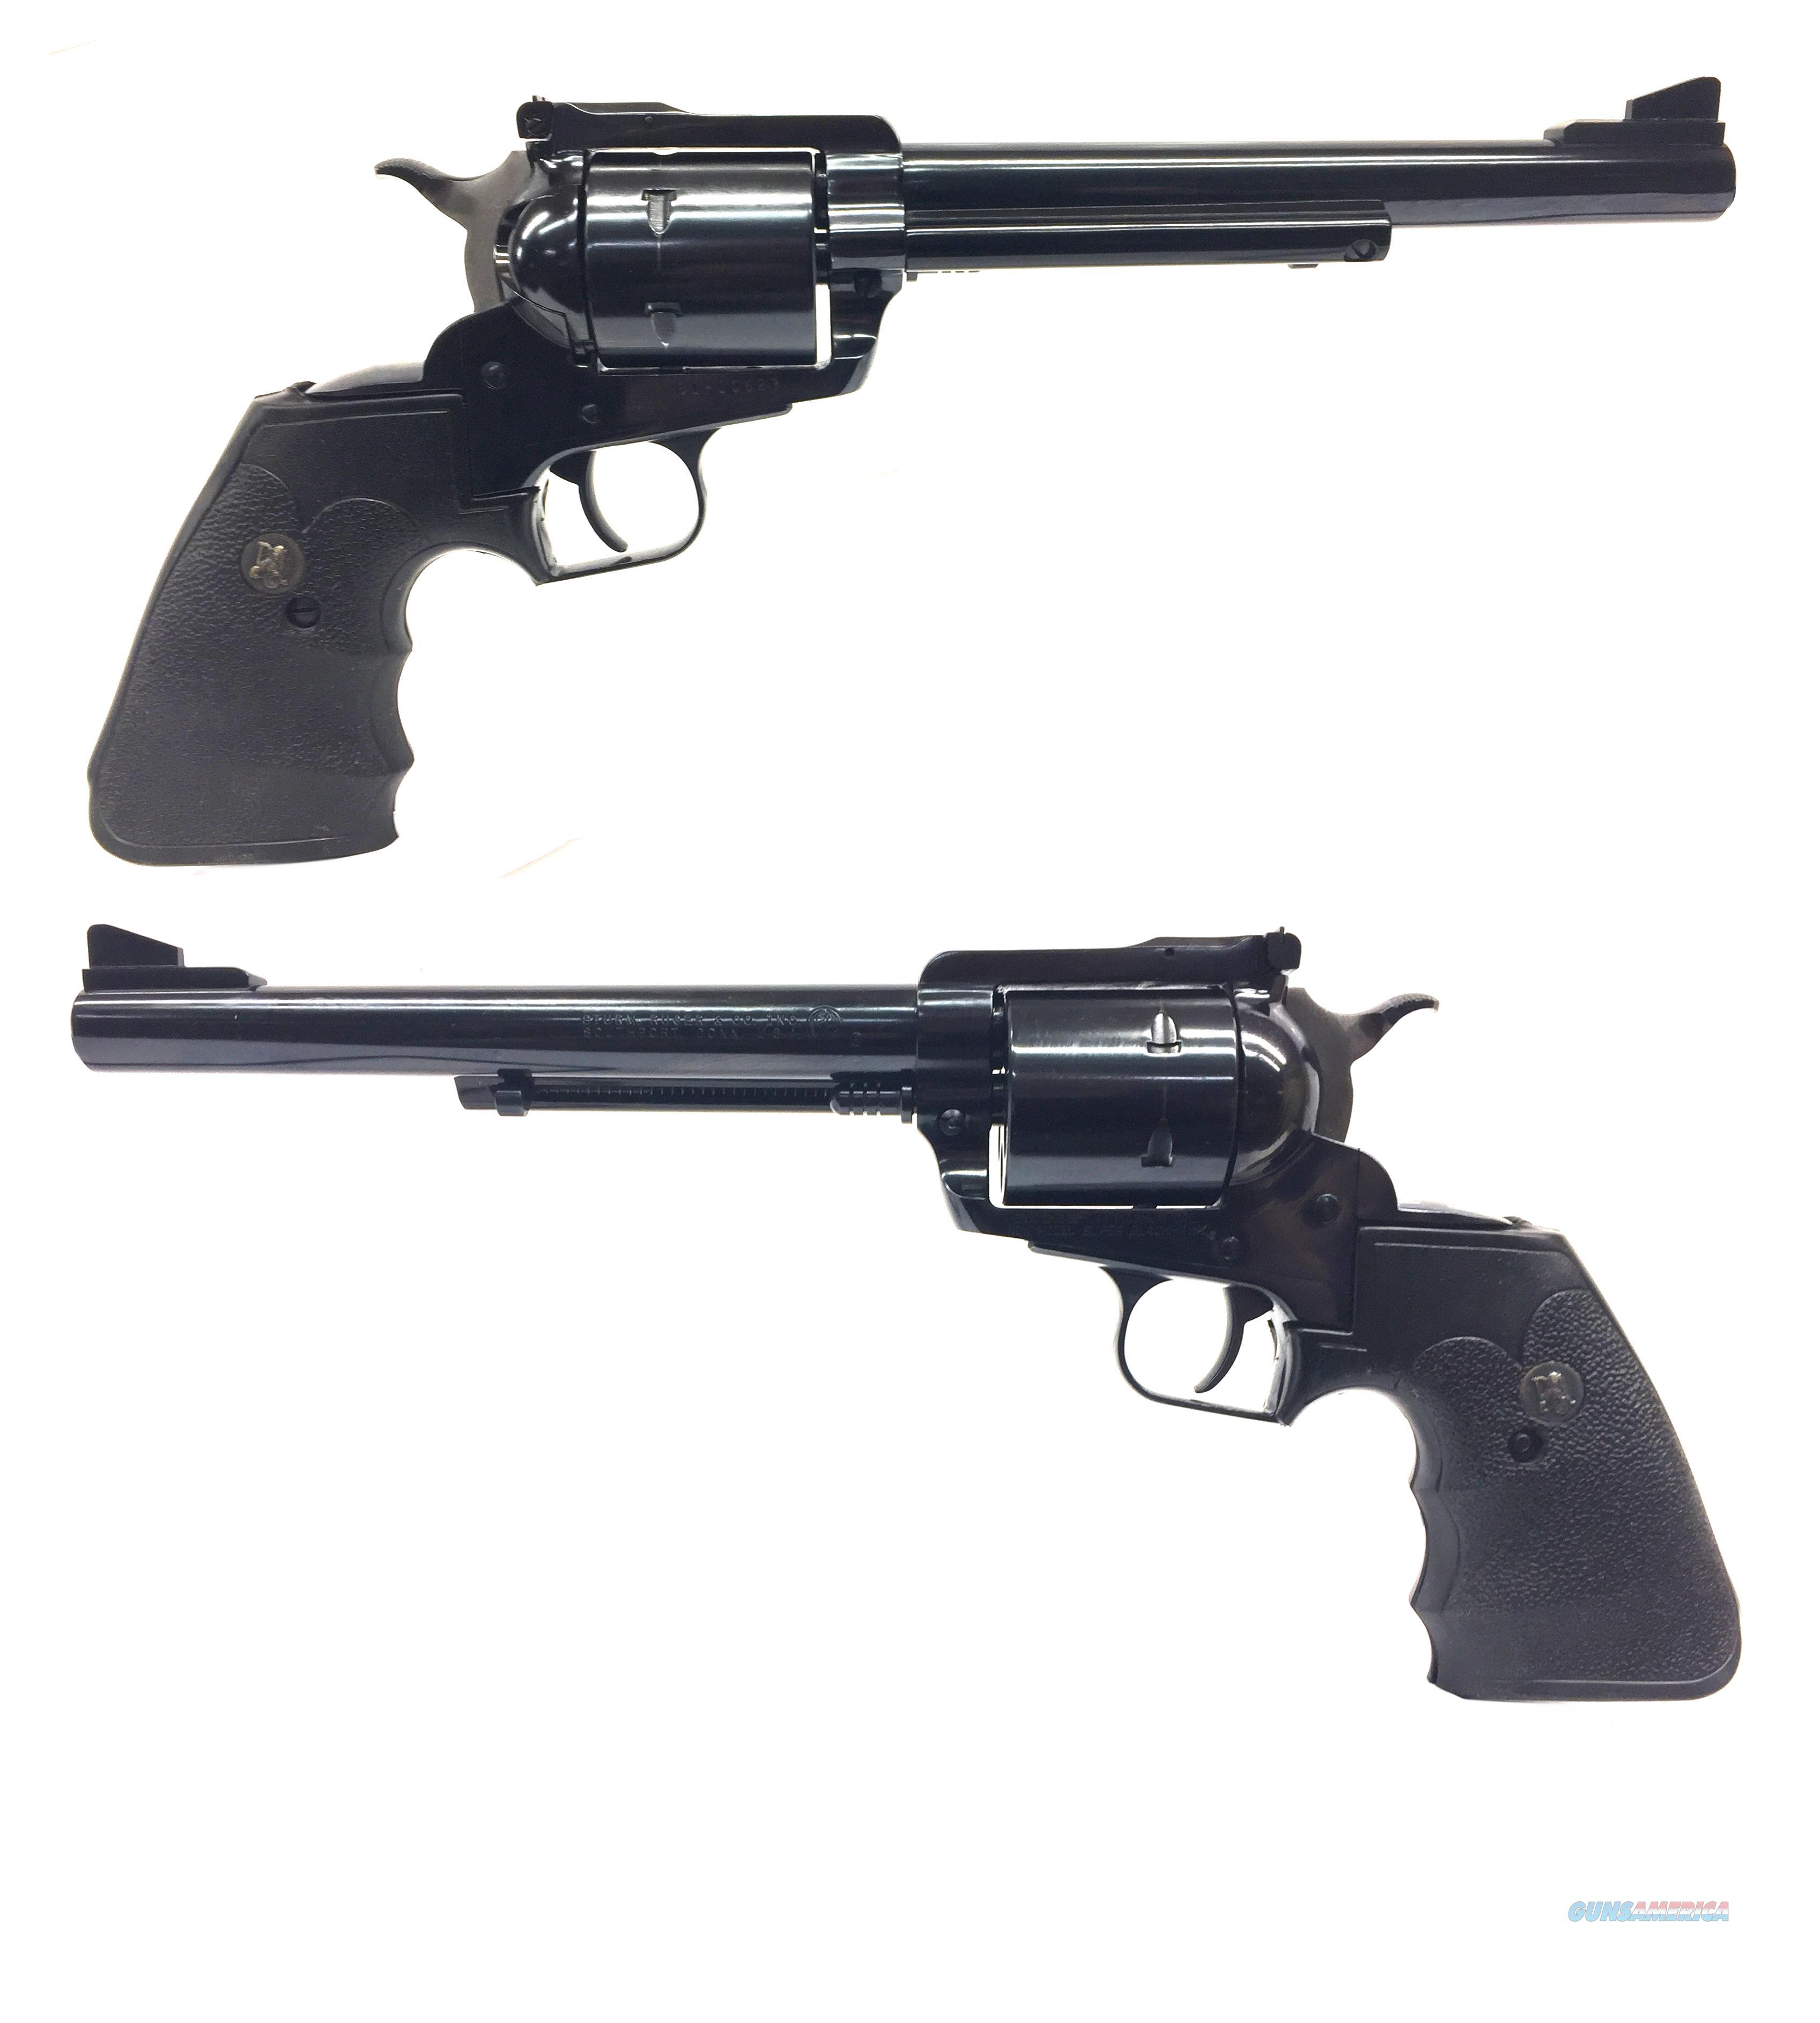 Ruger Super Blackhawk .44 MAG Revolver  Guns > Pistols > Ruger Single Action Revolvers > Blackhawk Type